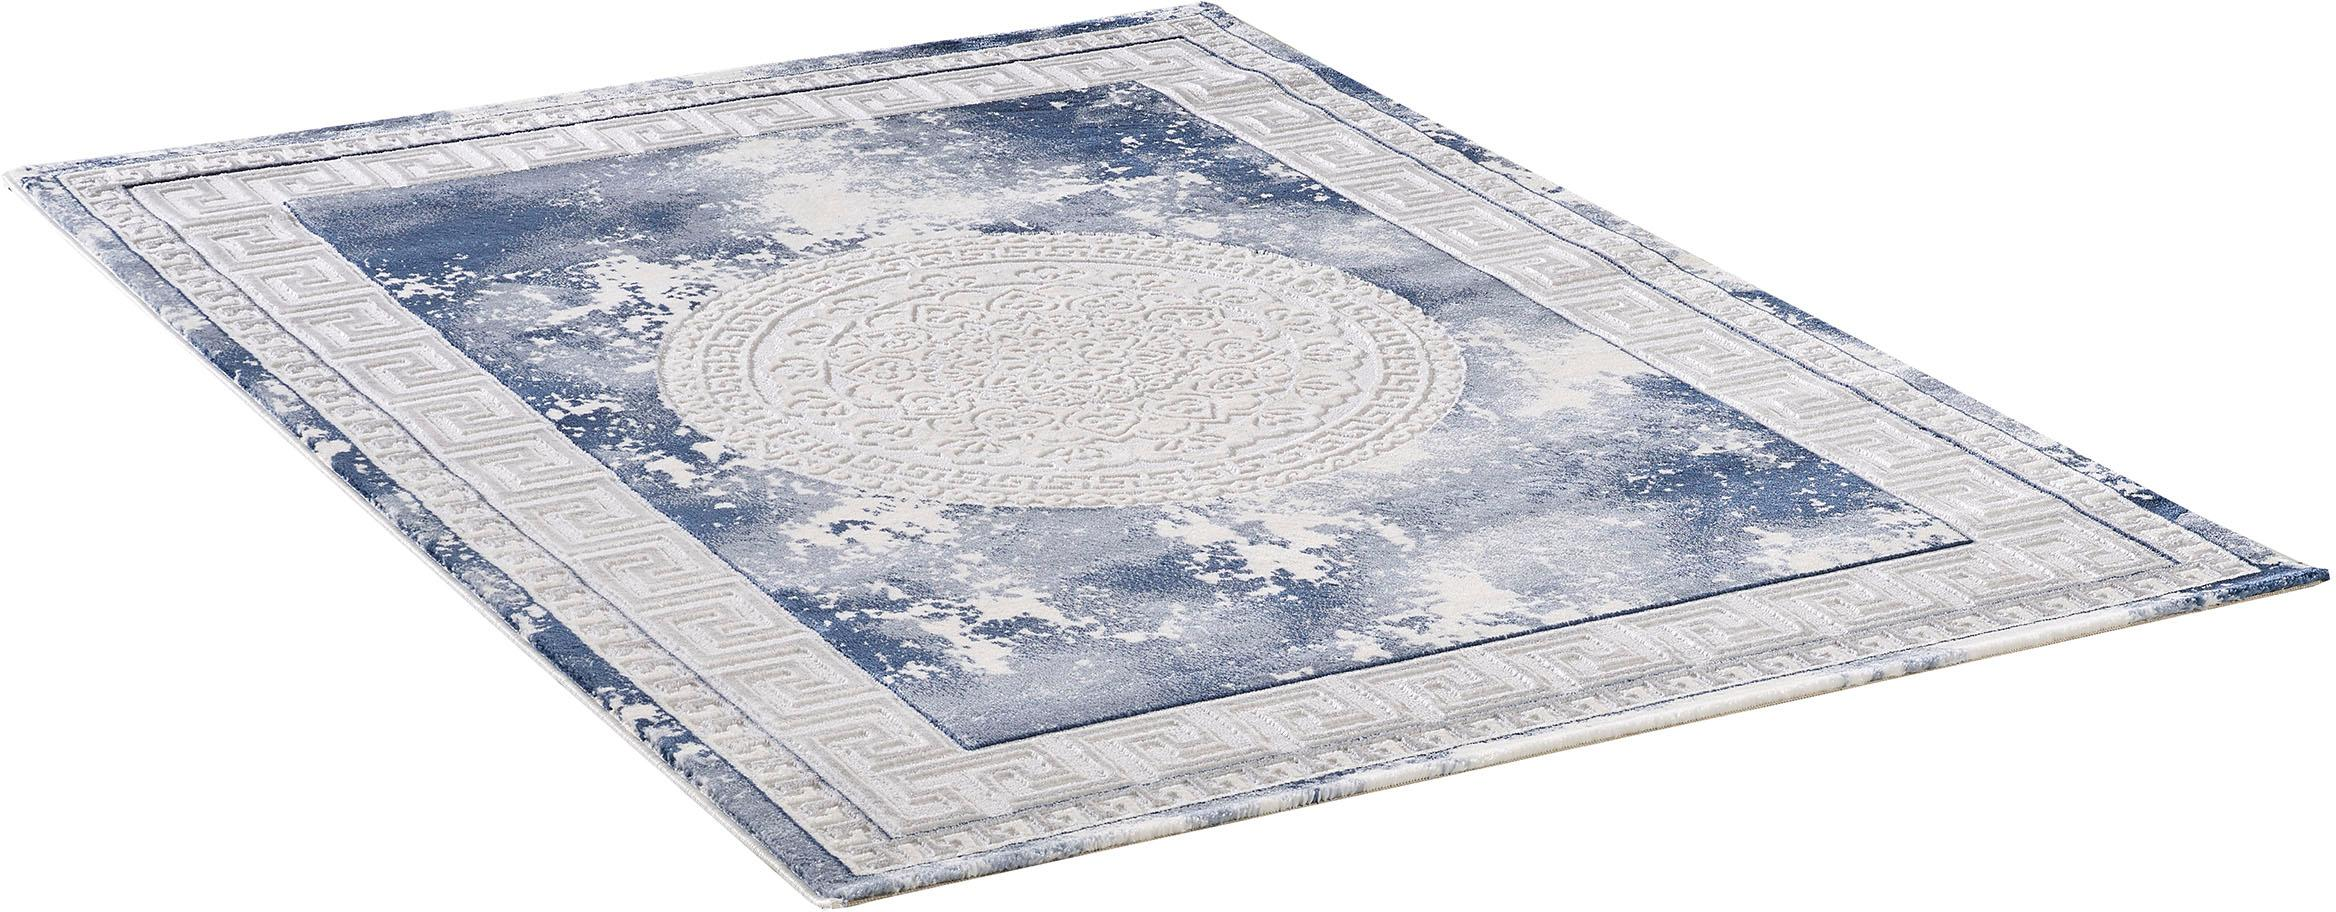 Teppich Harmony 3213 Sanat Teppiche rechteckig Höhe 12 mm maschinell gewebt